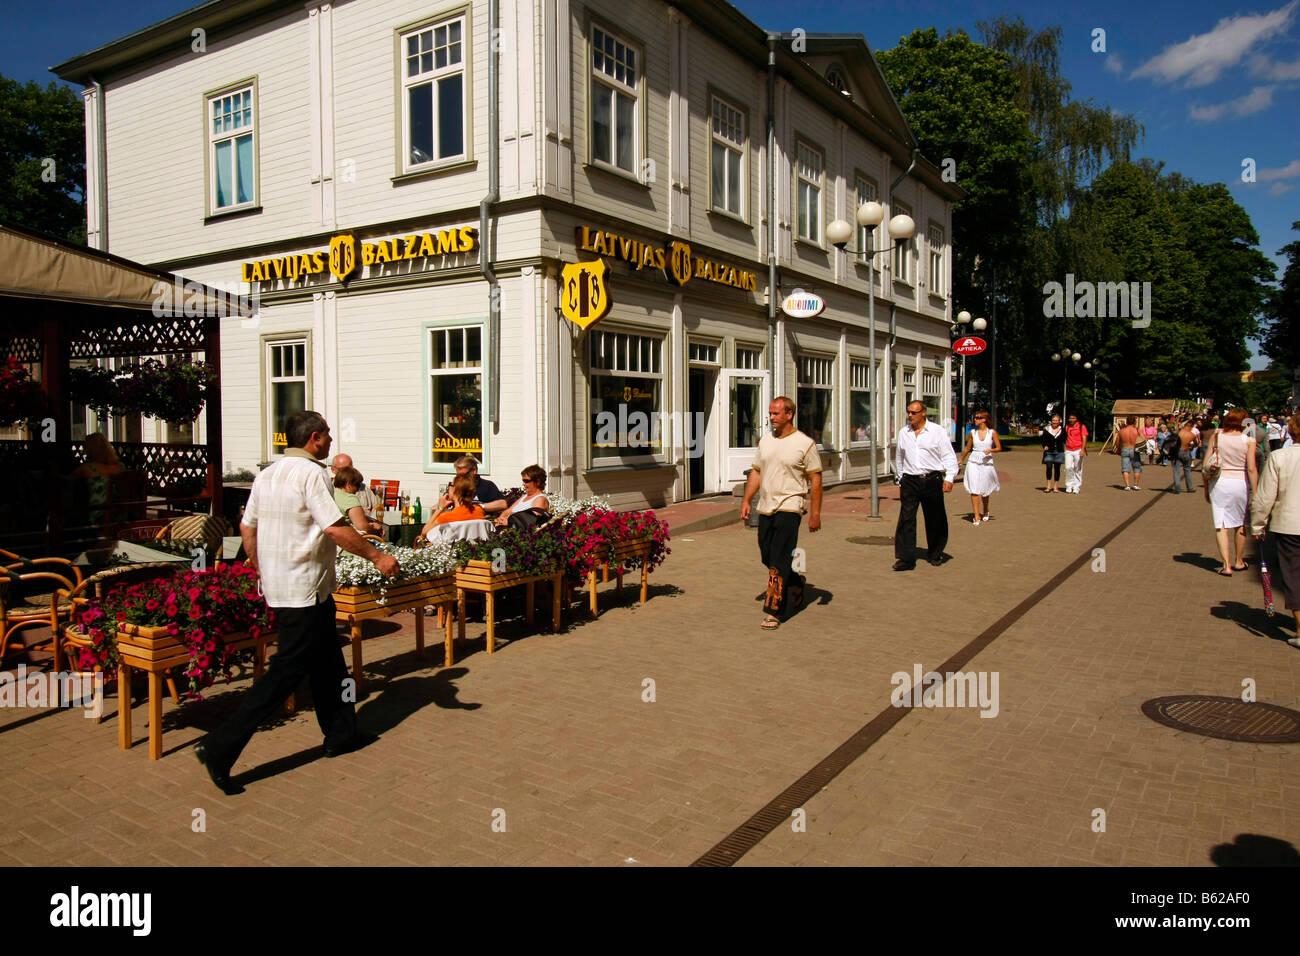 Street cafe in the pedestrian area Jomas iela in Jurmala, Latvia, Baltic Countries - Stock Image